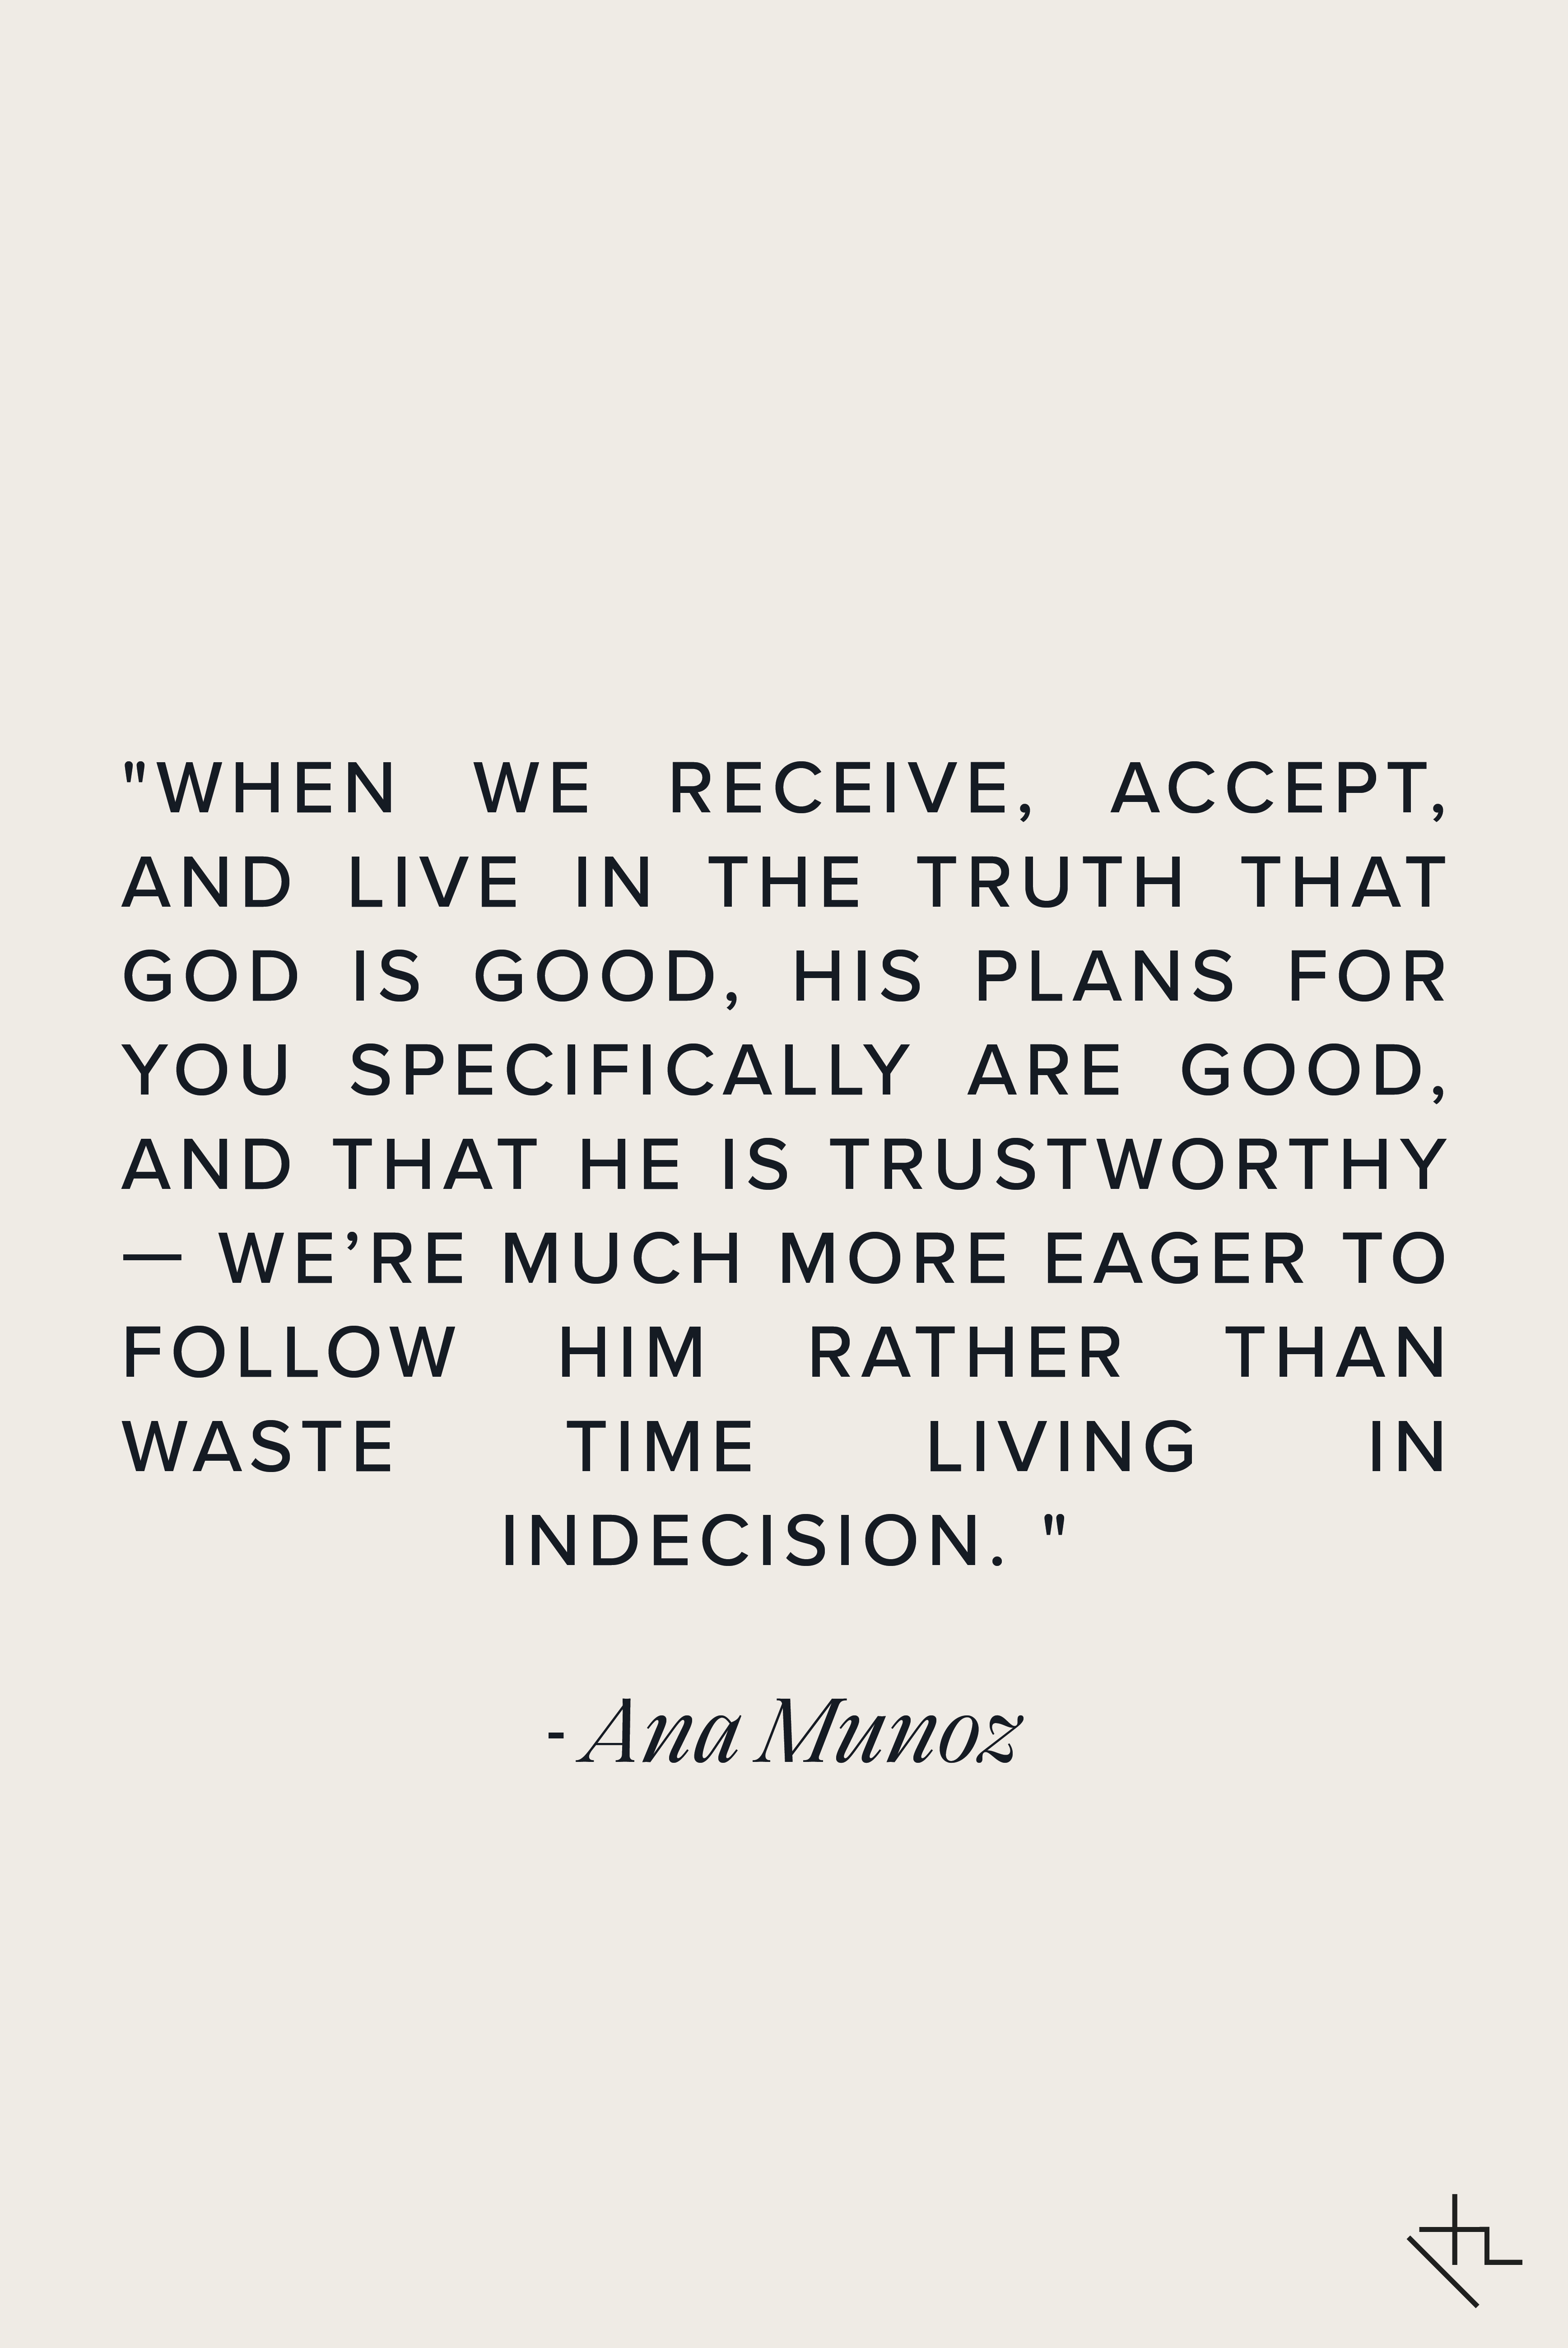 Ana Munoz - Pinterest Image